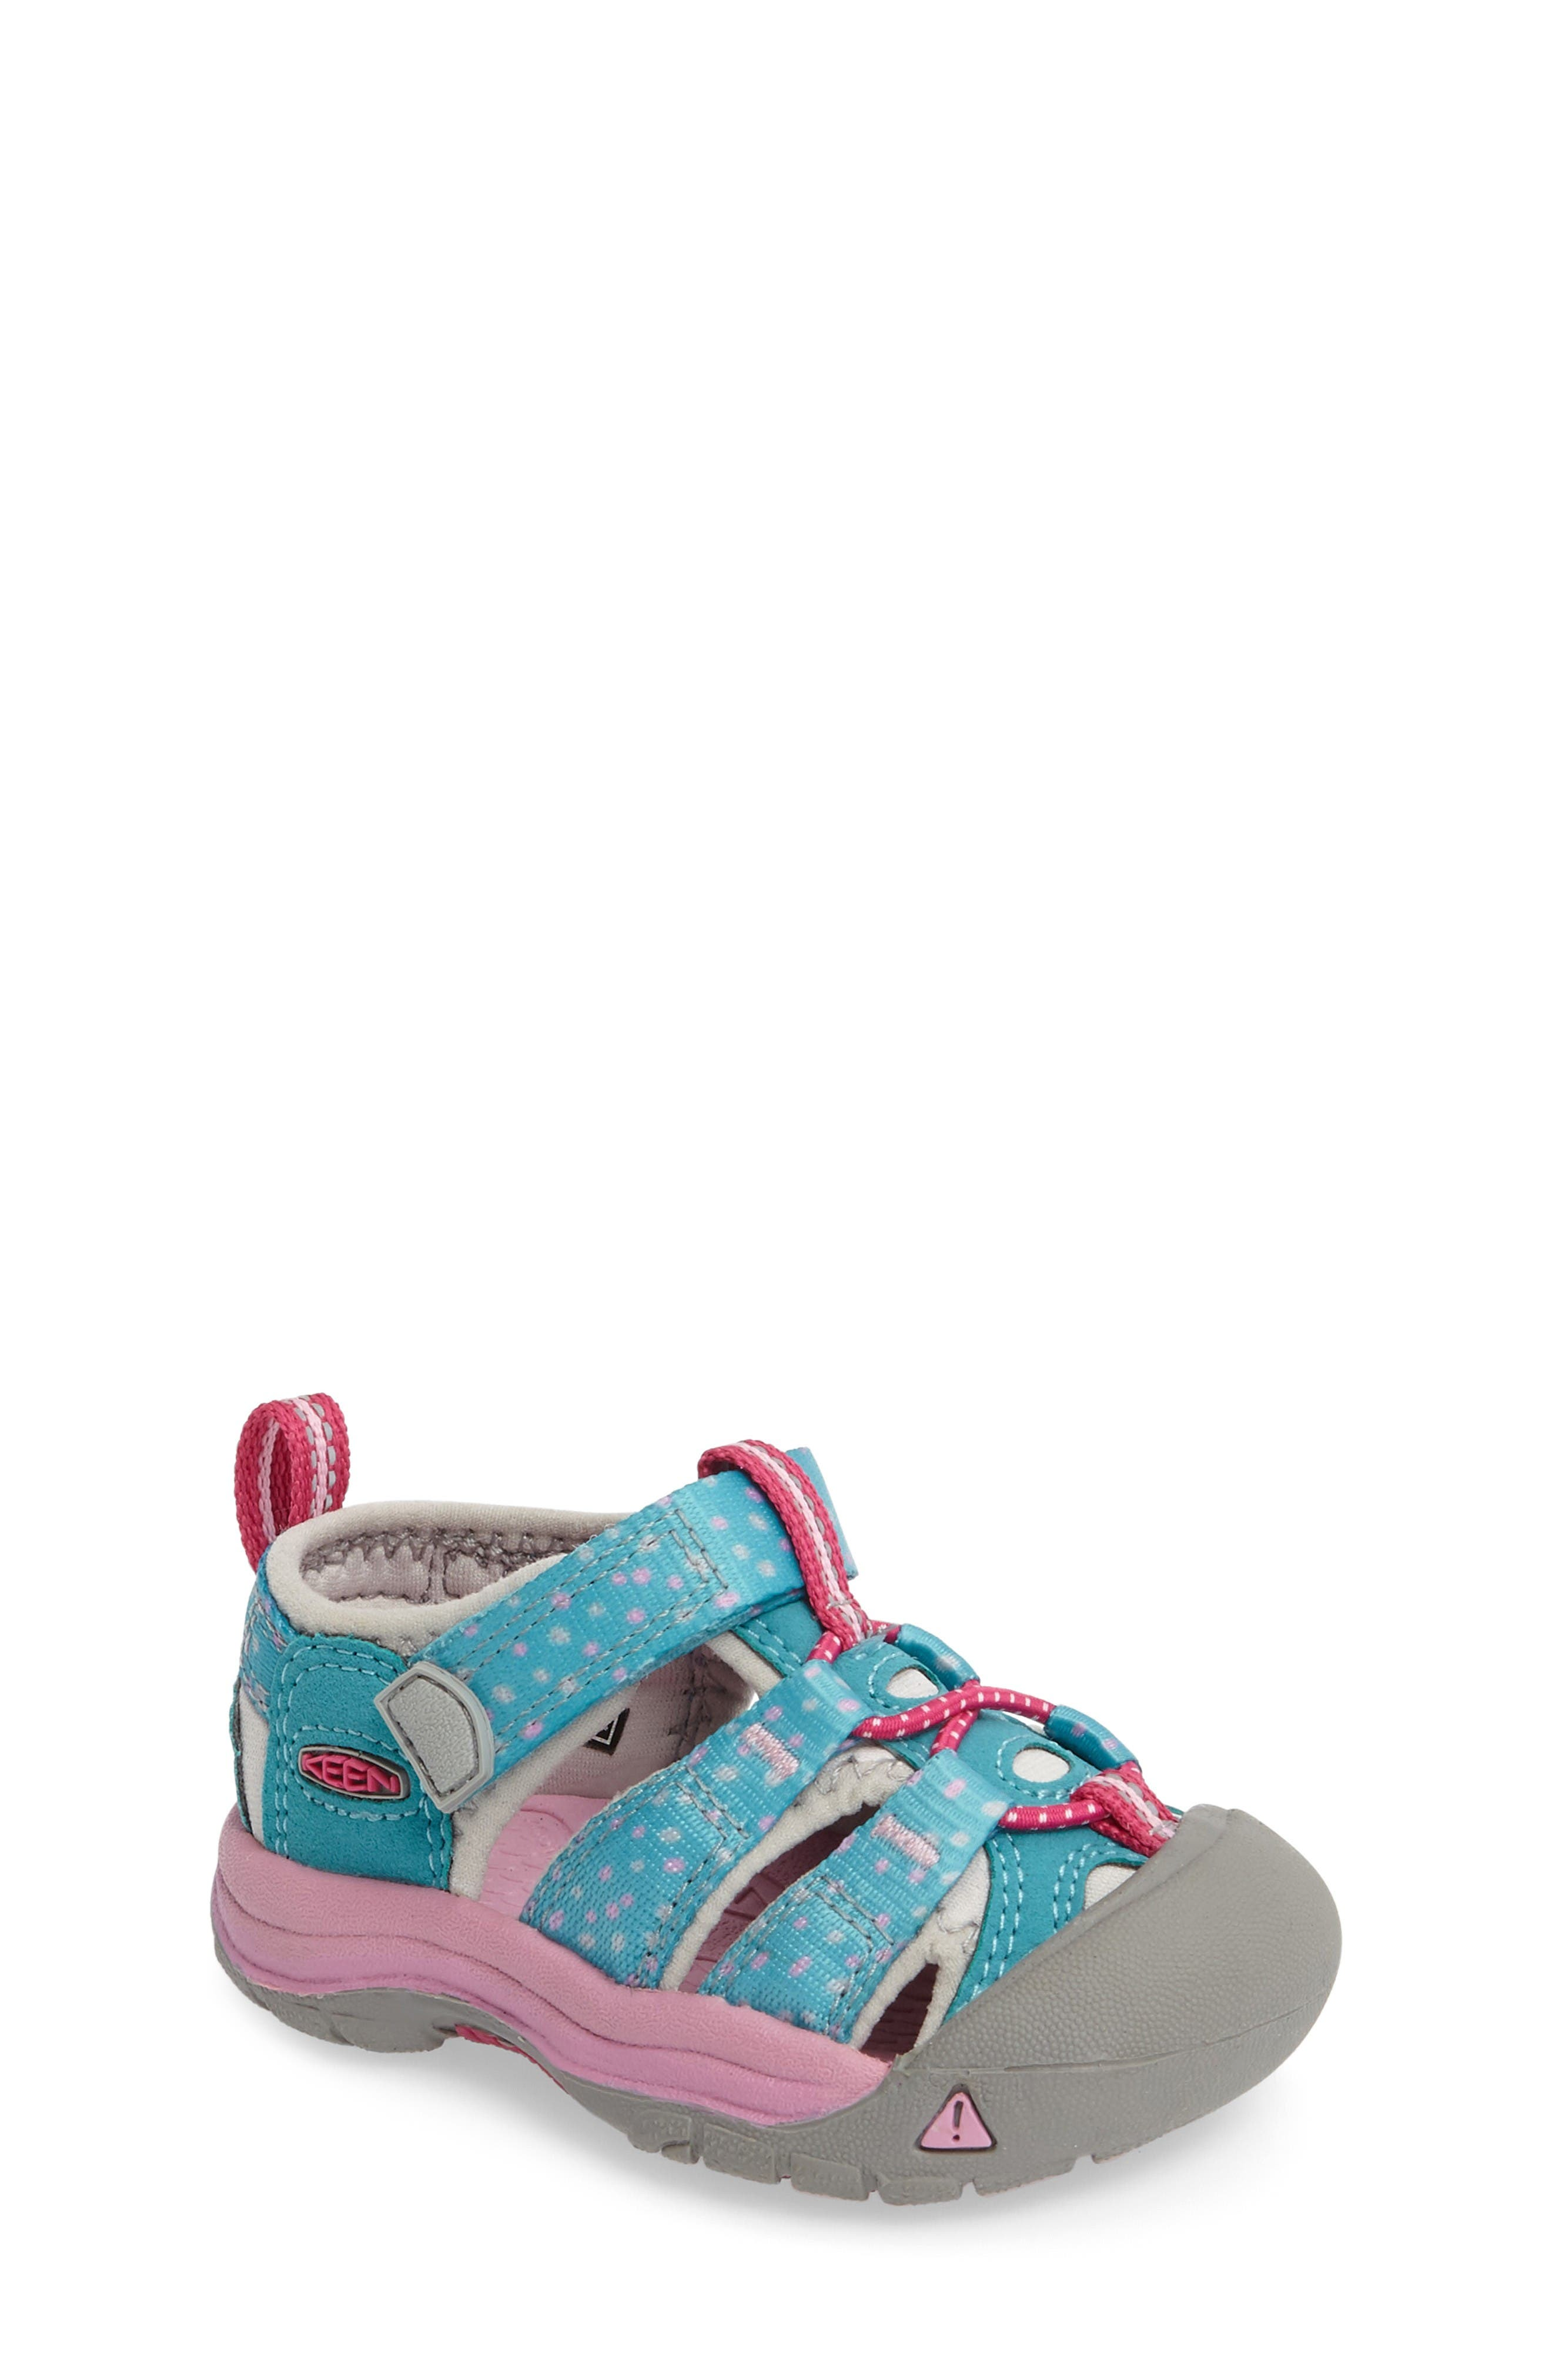 KEEN Newport H2 Water Friendly Sandal